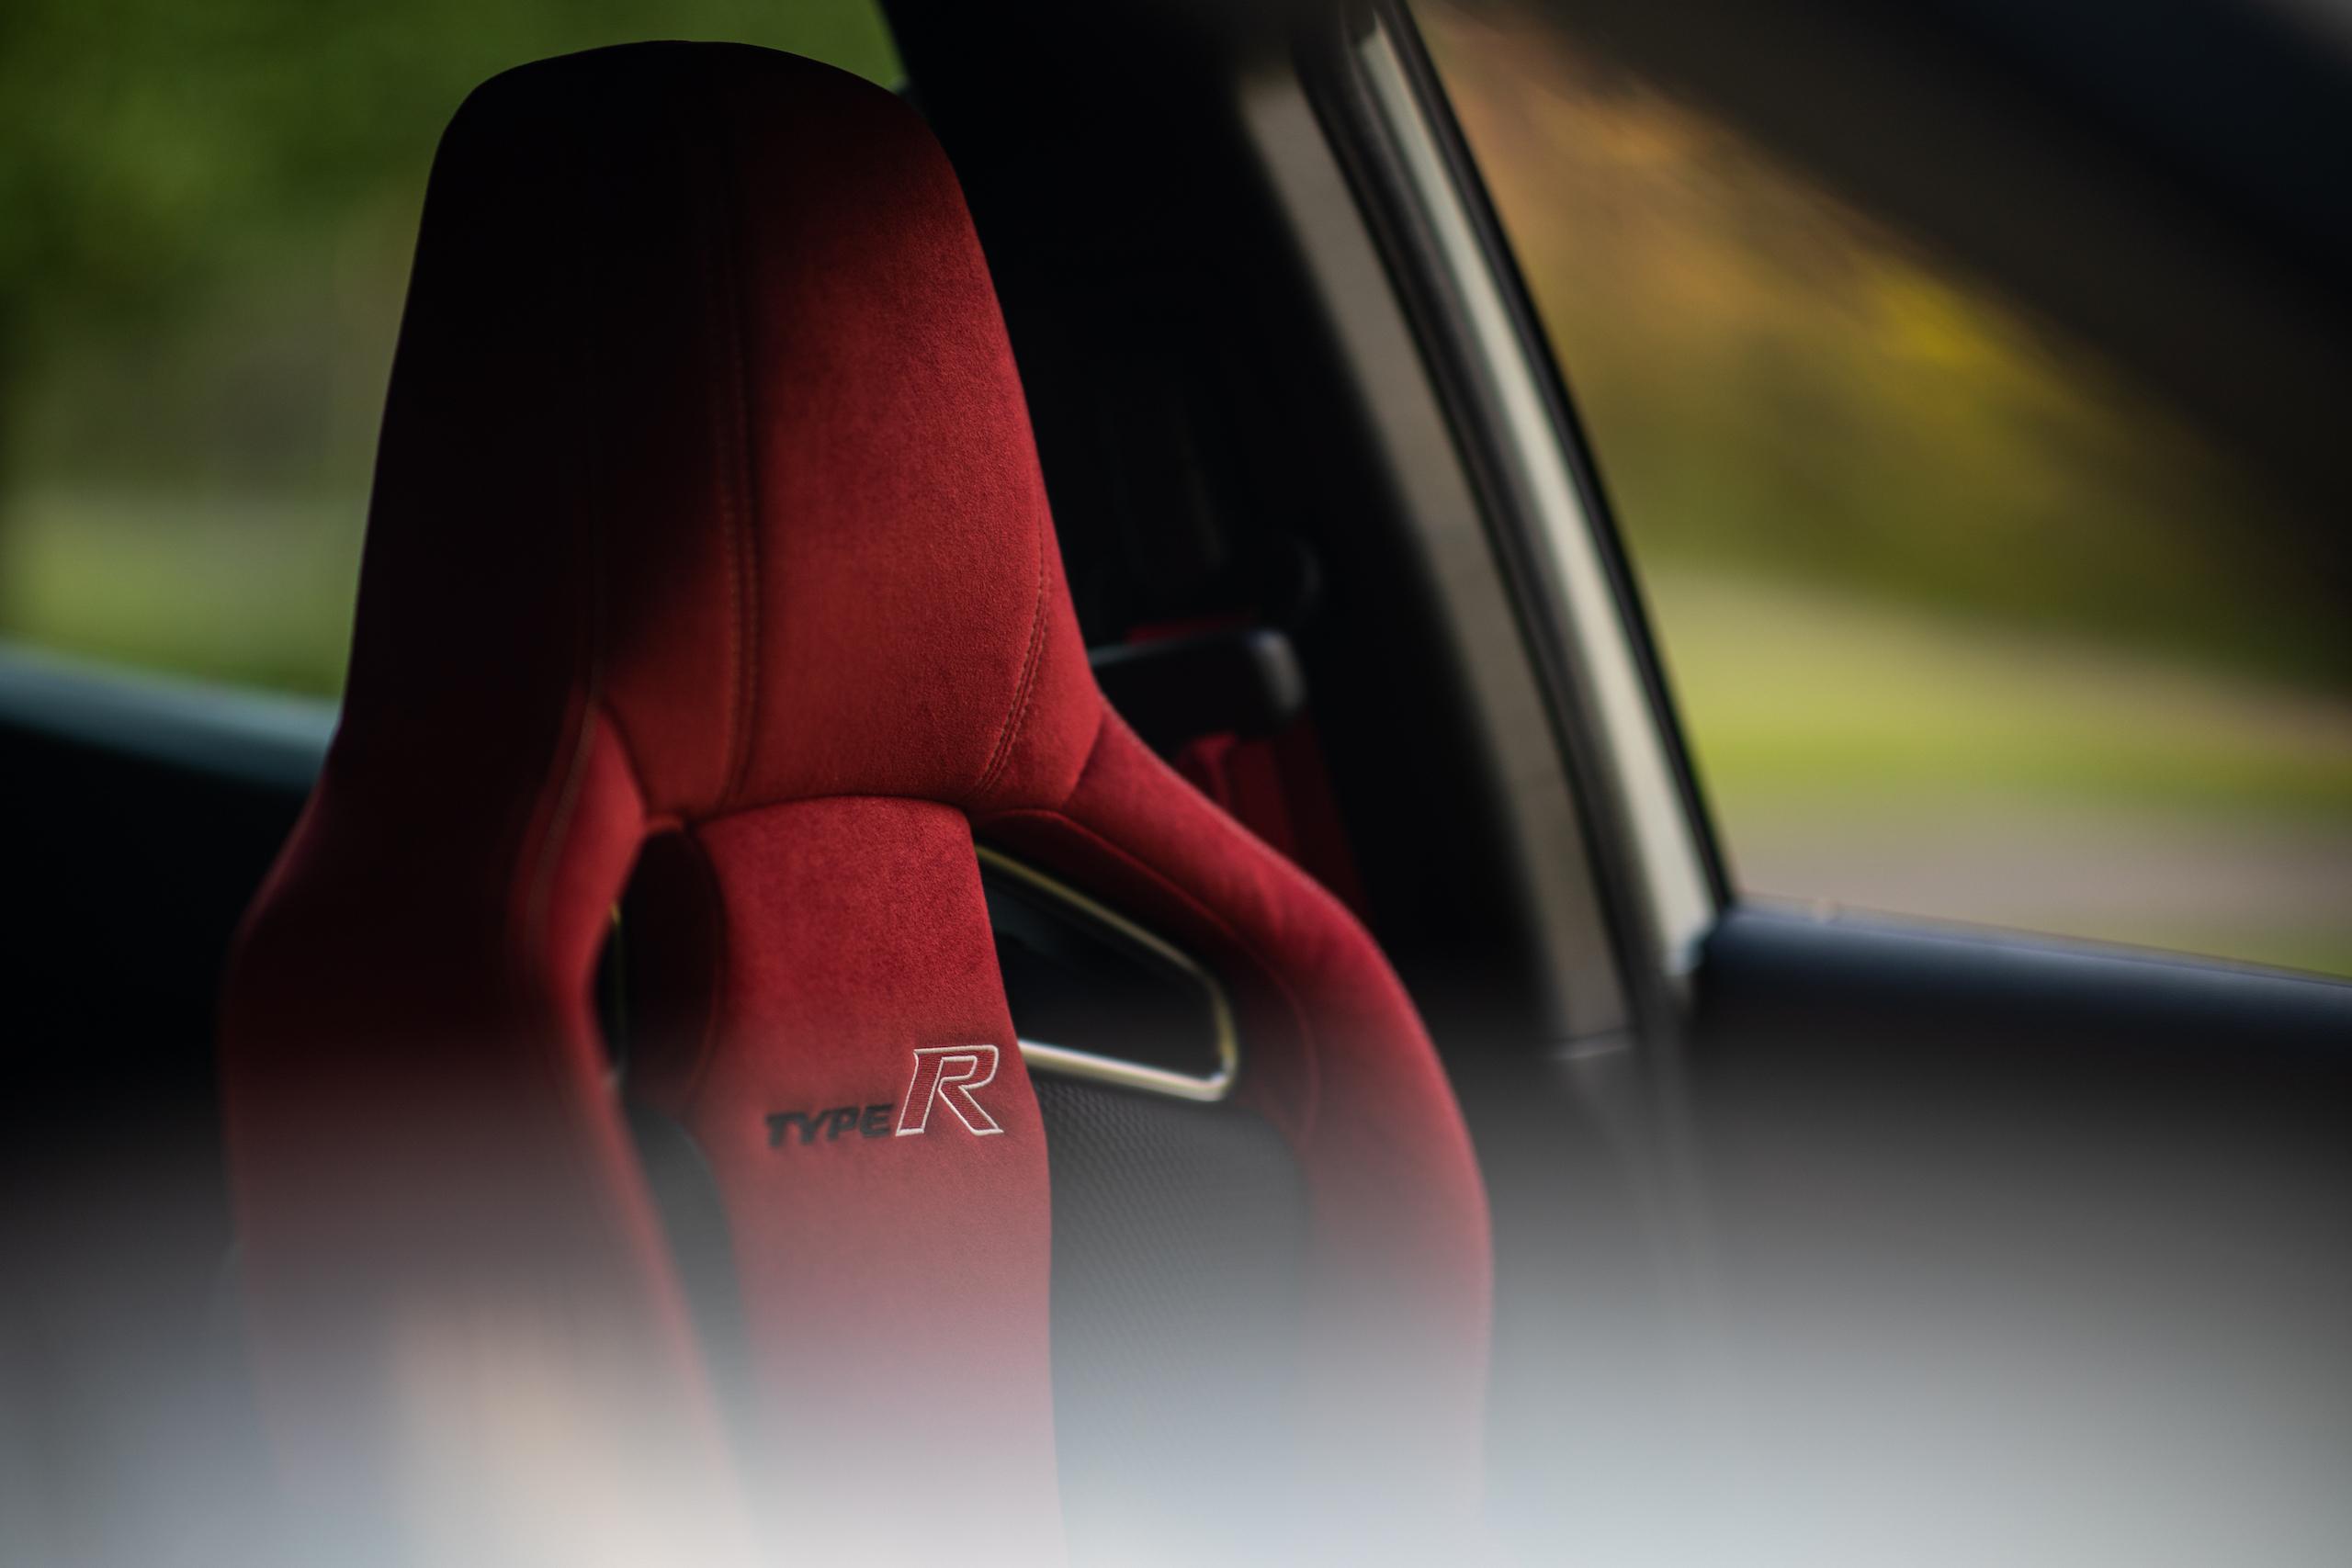 2020 Honda Civic Type R interior seat detail